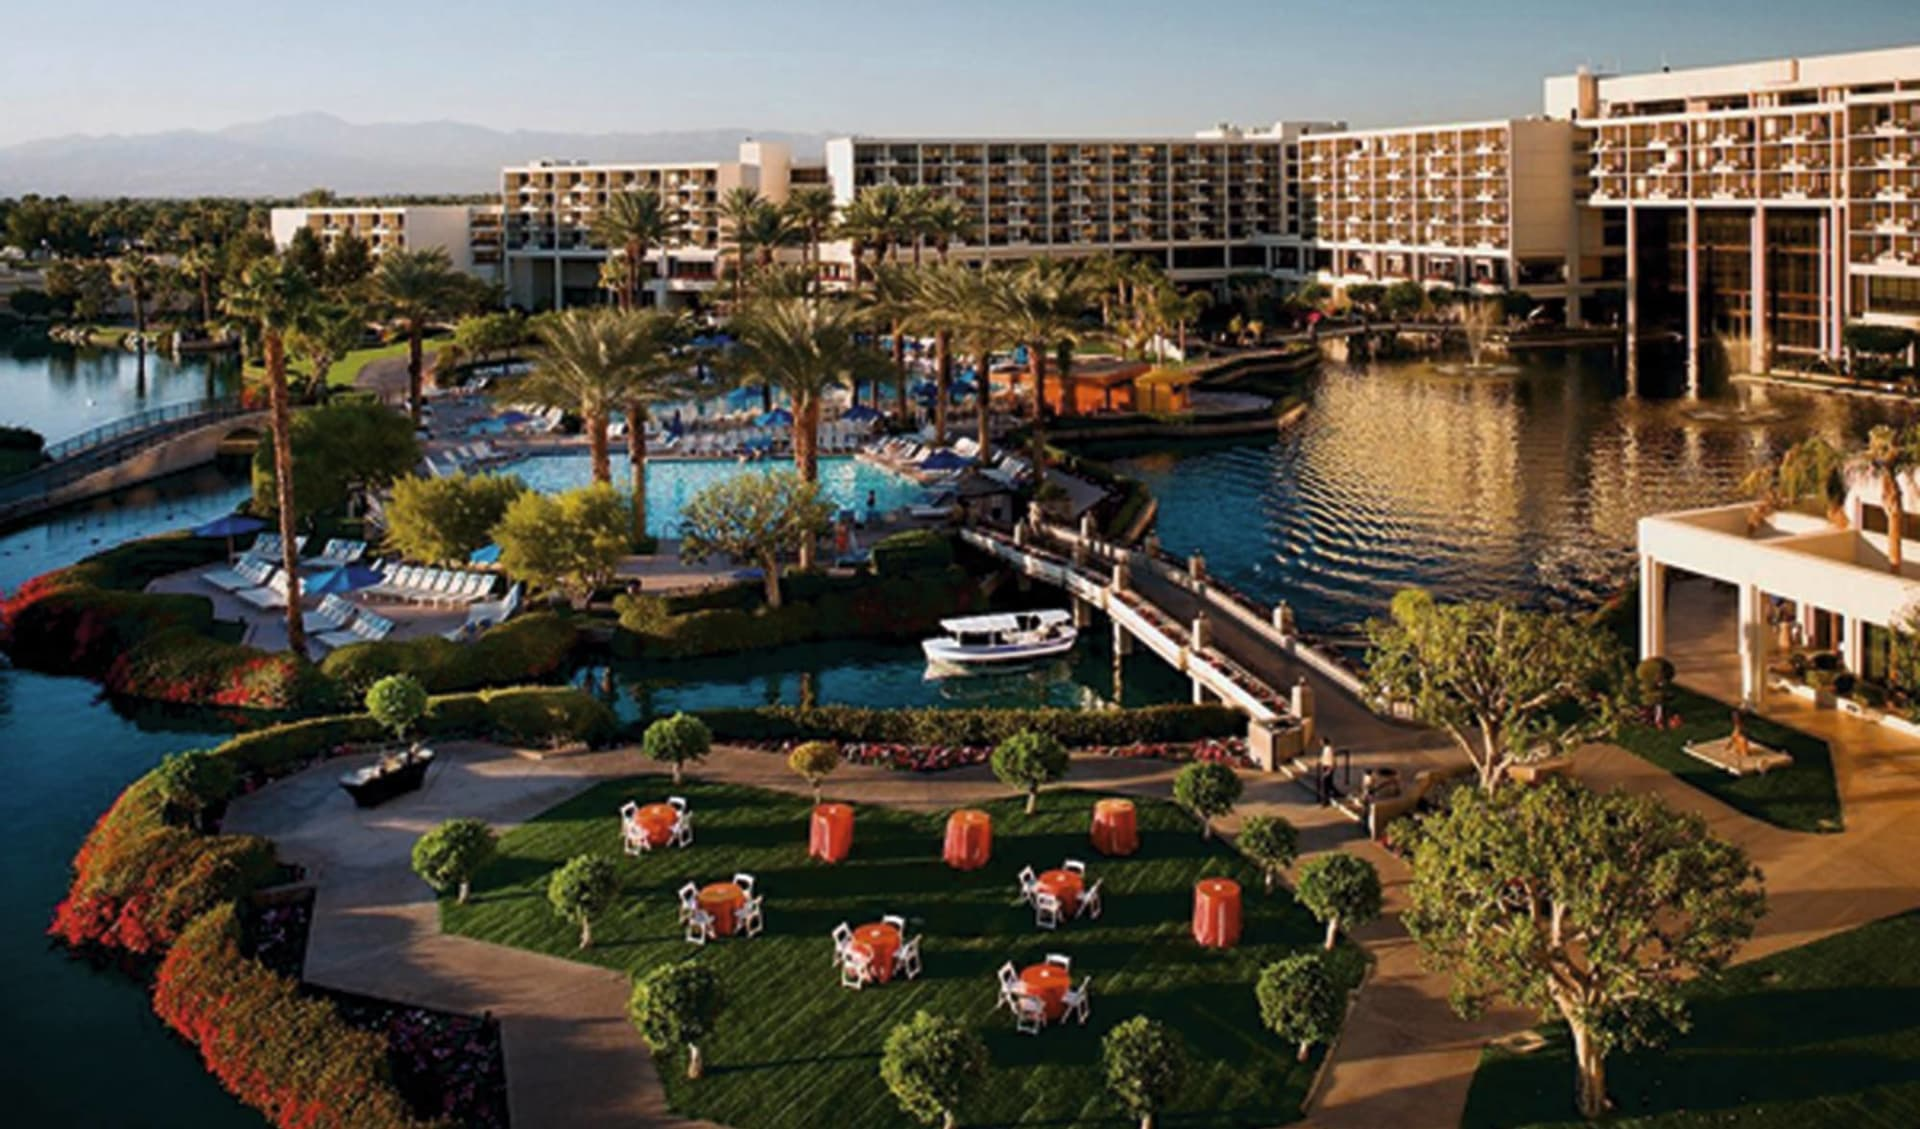 JW Marriott Desert Springs Resort & Spa in Palm Desert: exterior jw marriott desert springs resort gartenanlage hotel